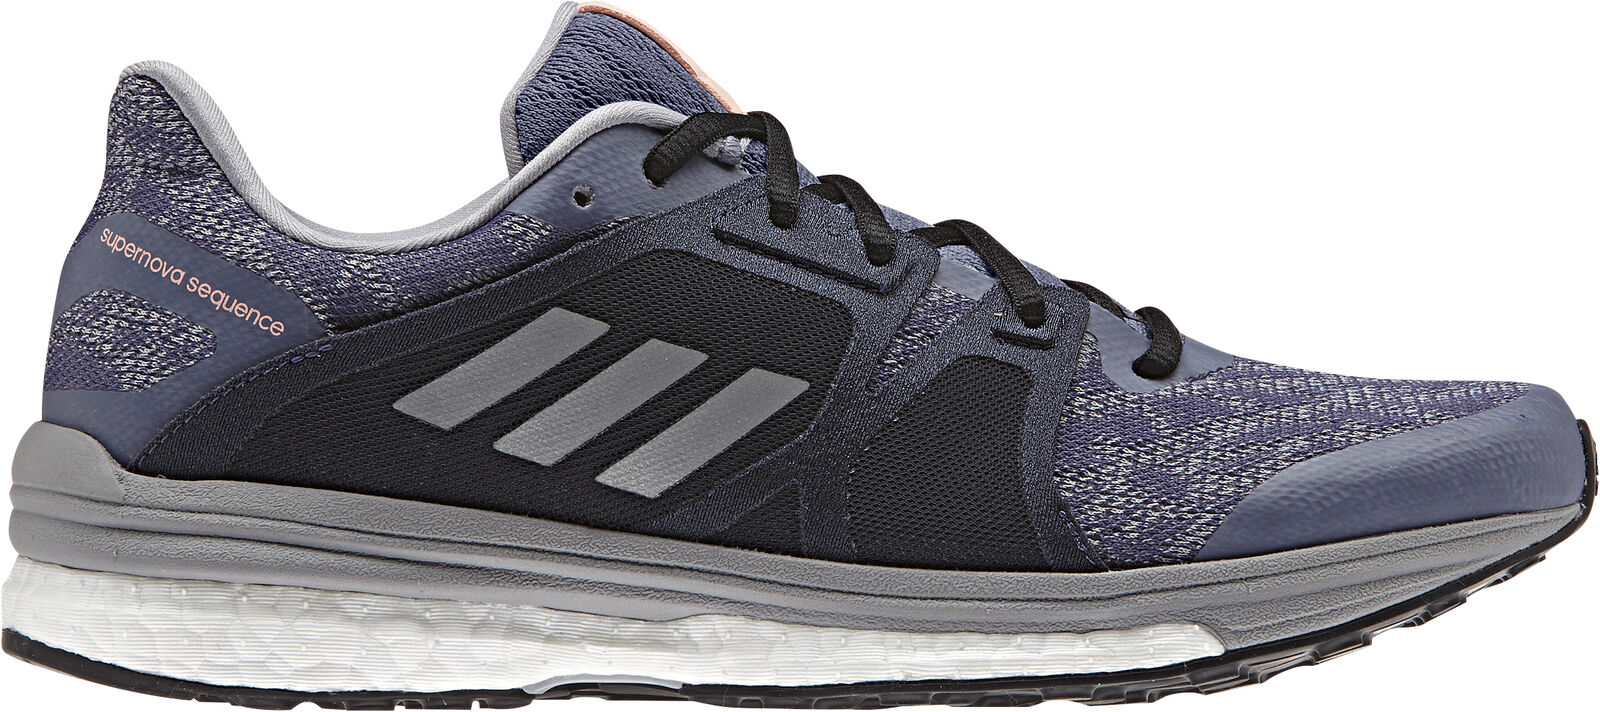 Adidas Supernova Sequence 9 Womens Running shoes - Grey